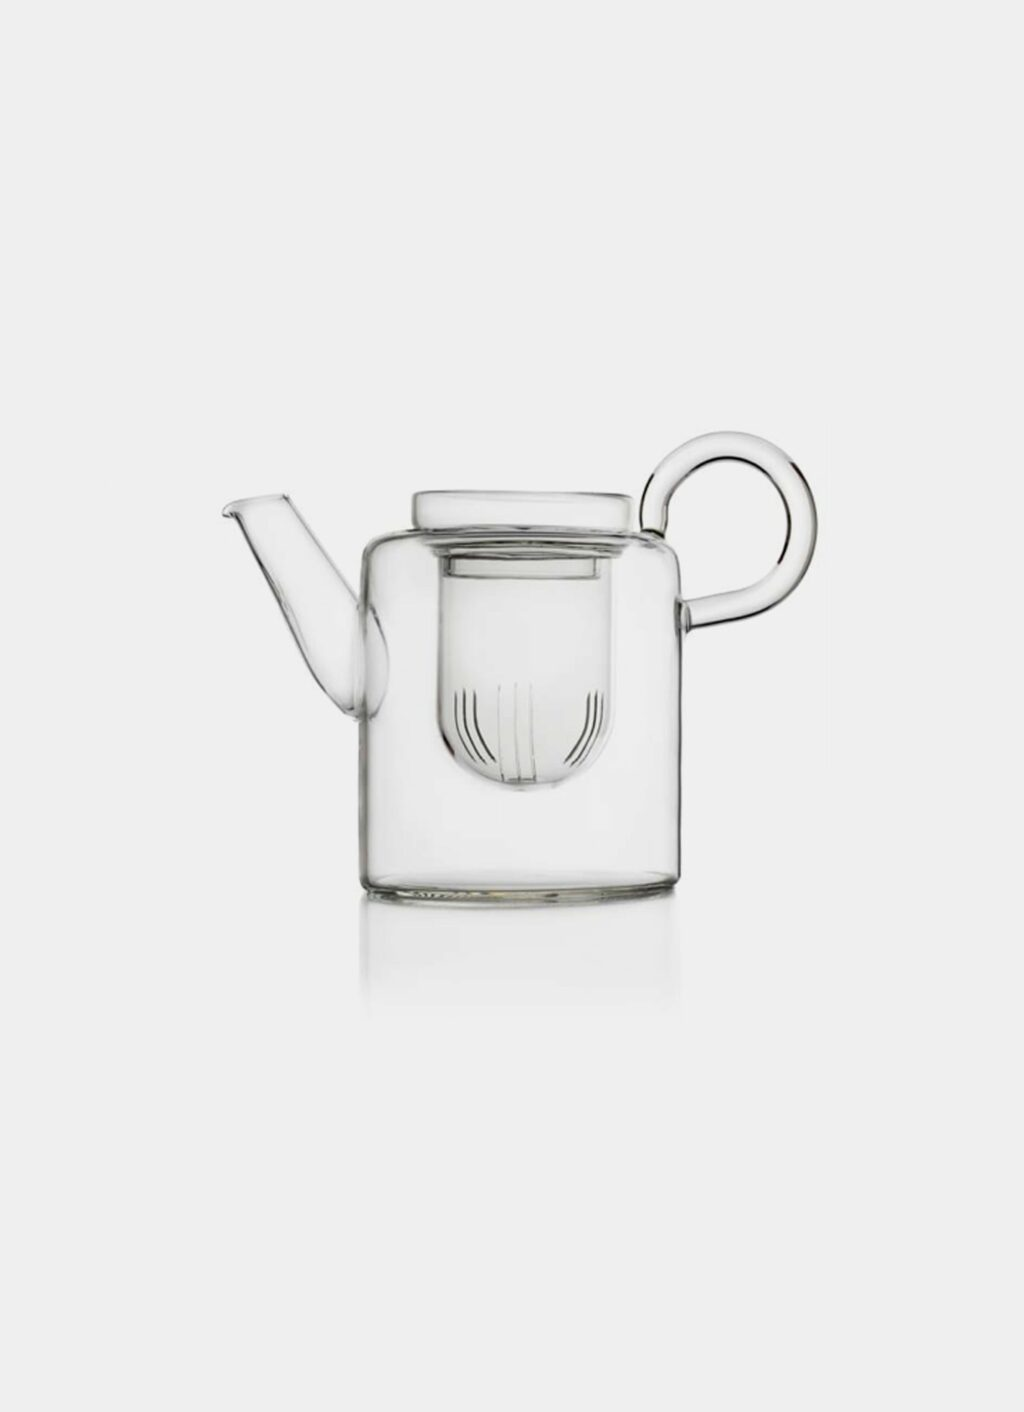 Ichendorf Milano - Marco Sironi - Piuma - Tall Tea pot with Filter